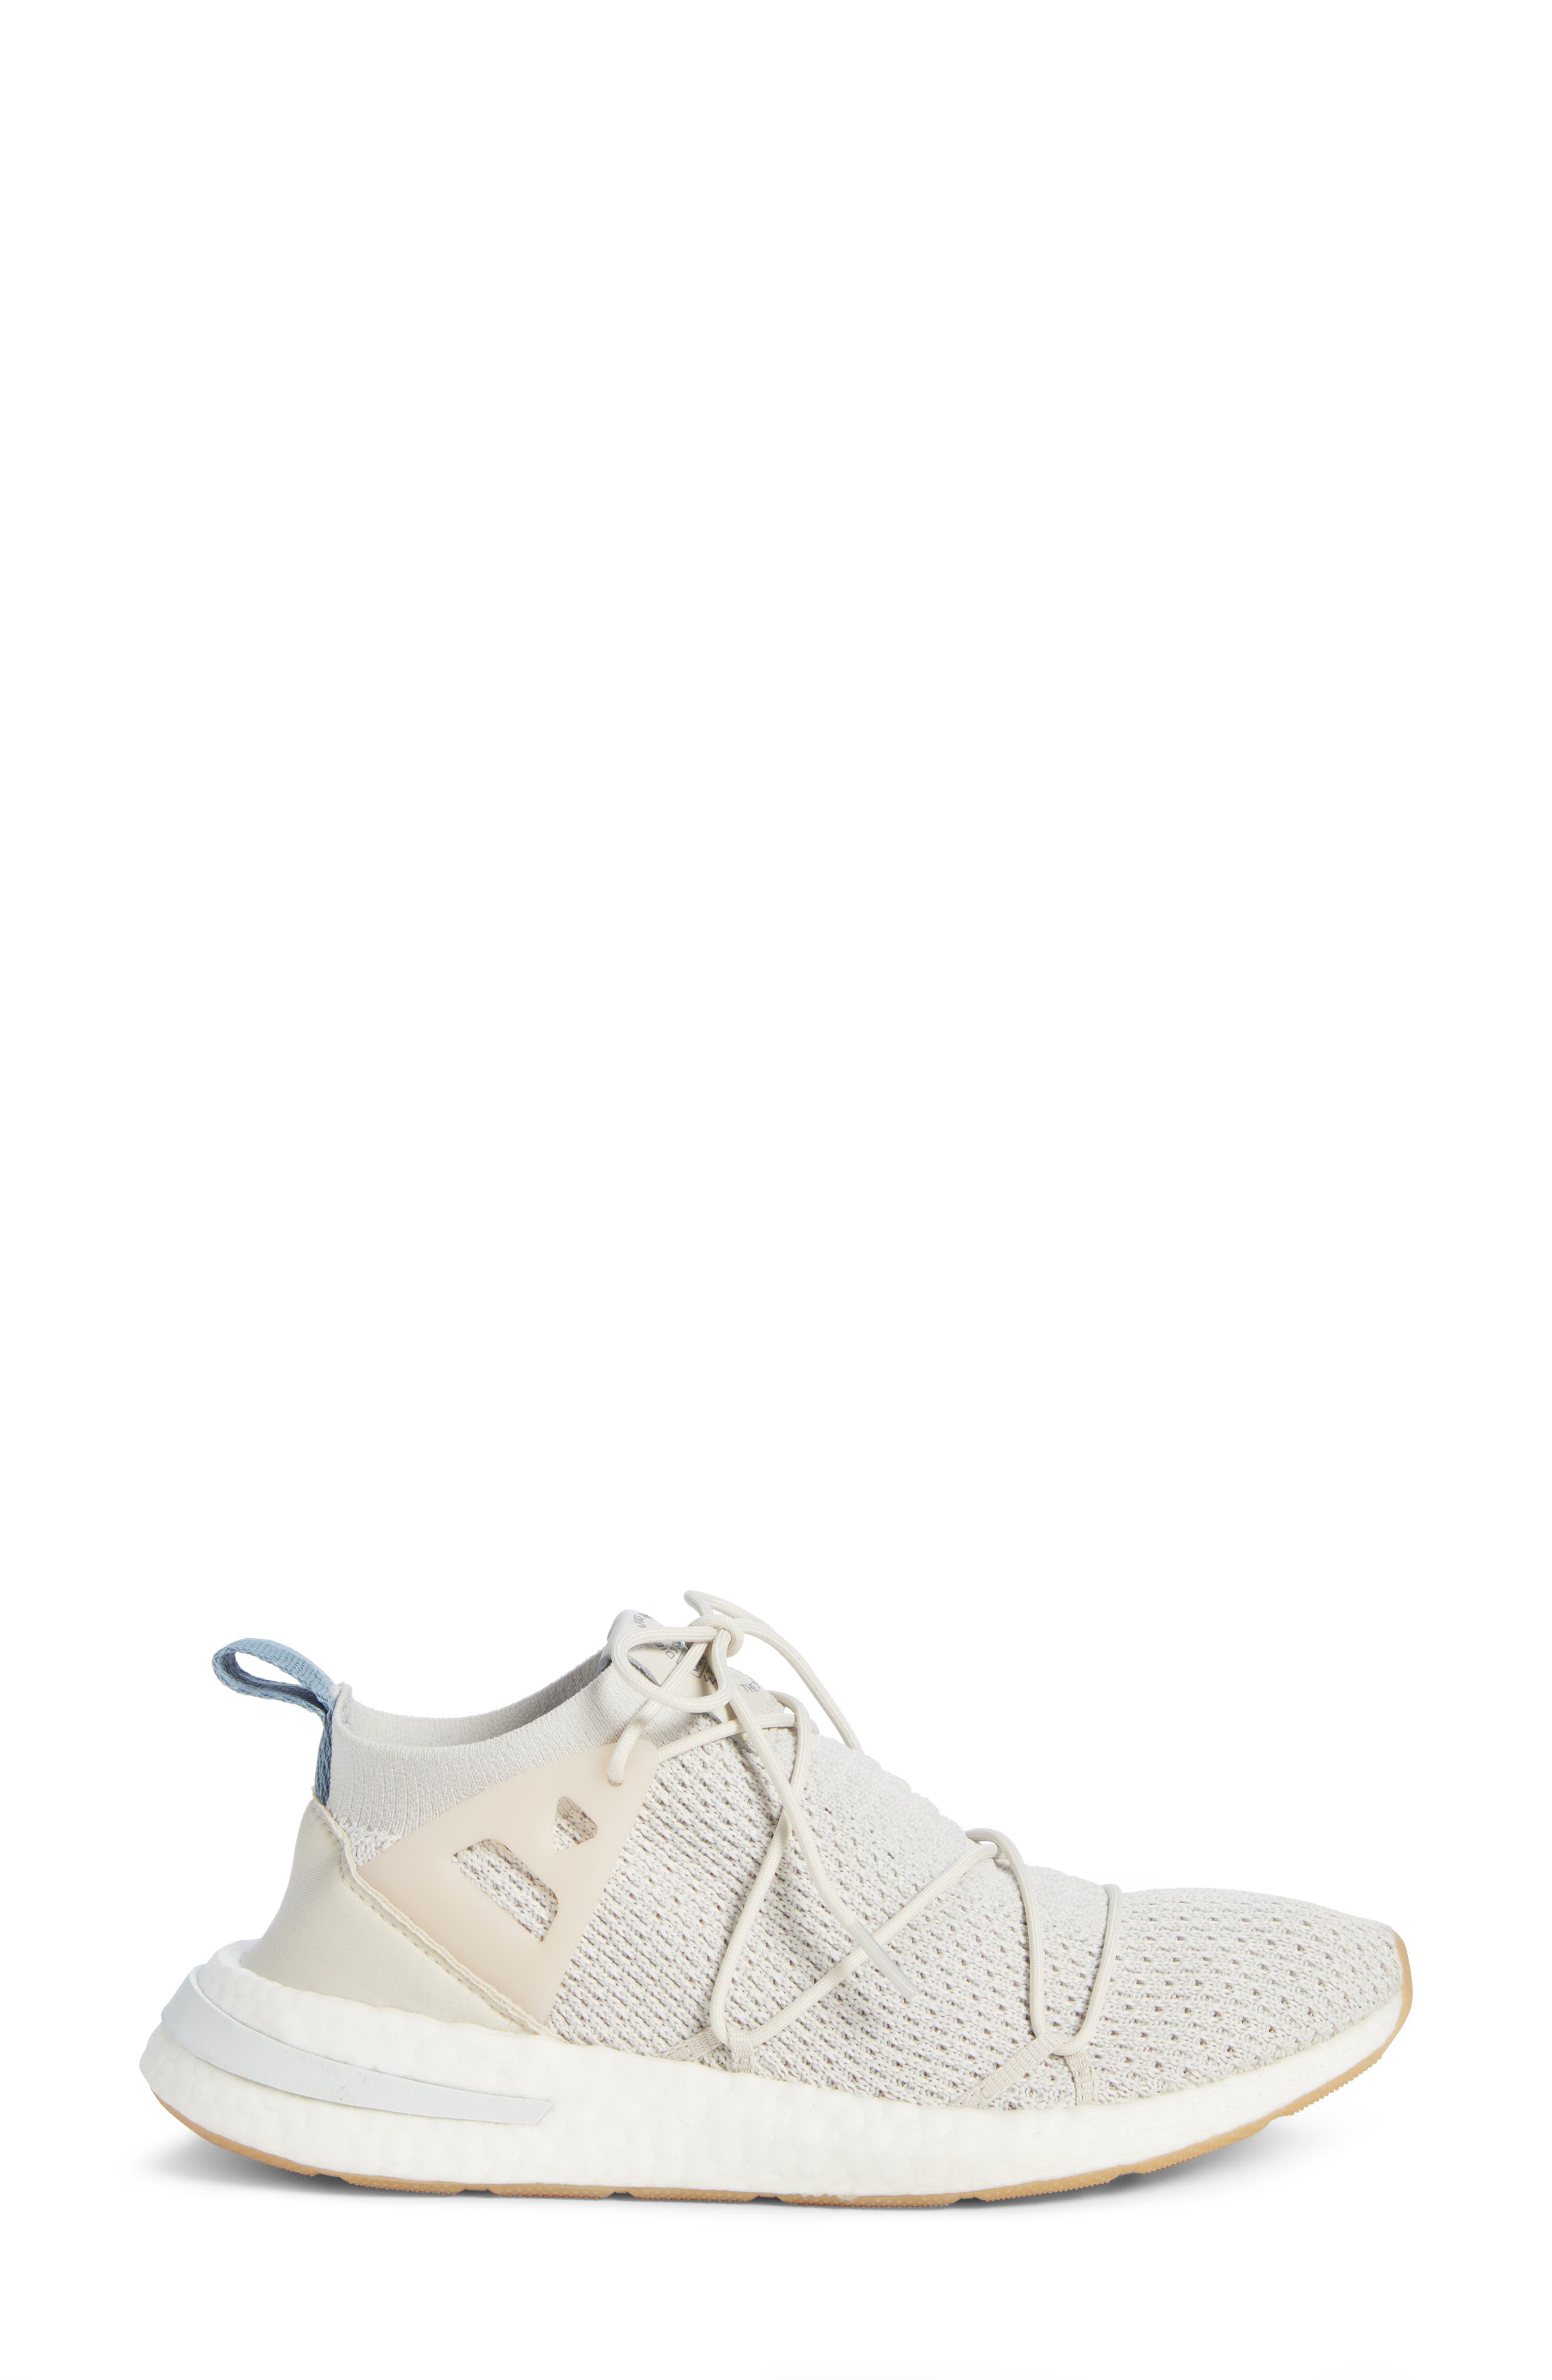 Arkyn Primeknit Sneaker,                             Alternate thumbnail 3, color,                             TALC/ TALC/ LINEN